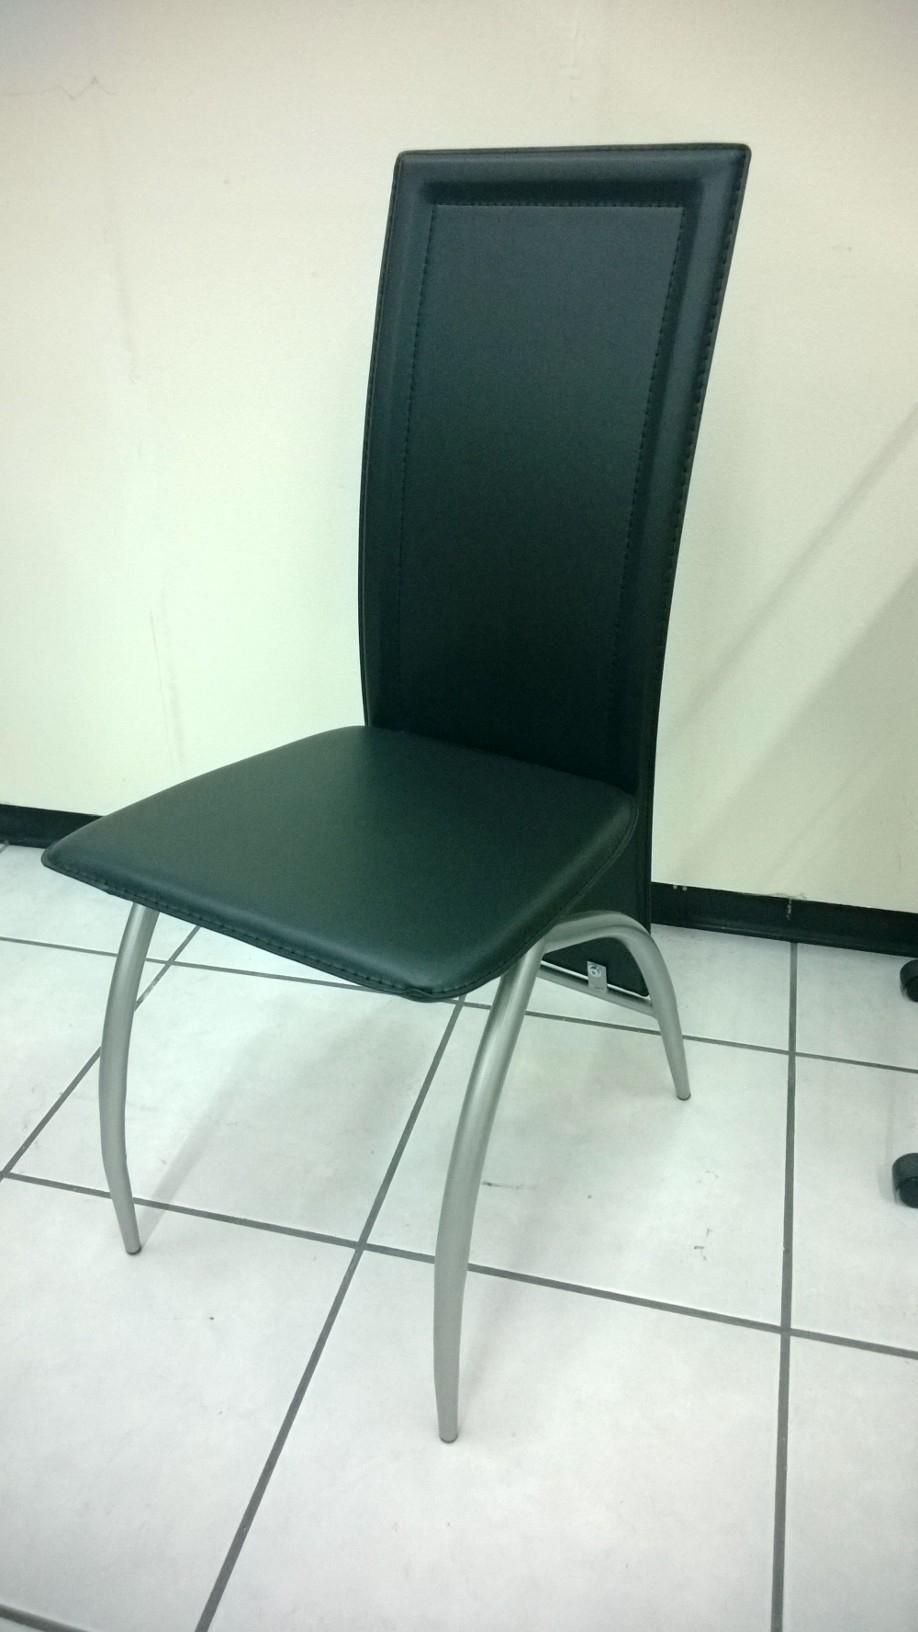 Sedia ecopelle in svendita sedie a prezzi scontati for Svendita sedie